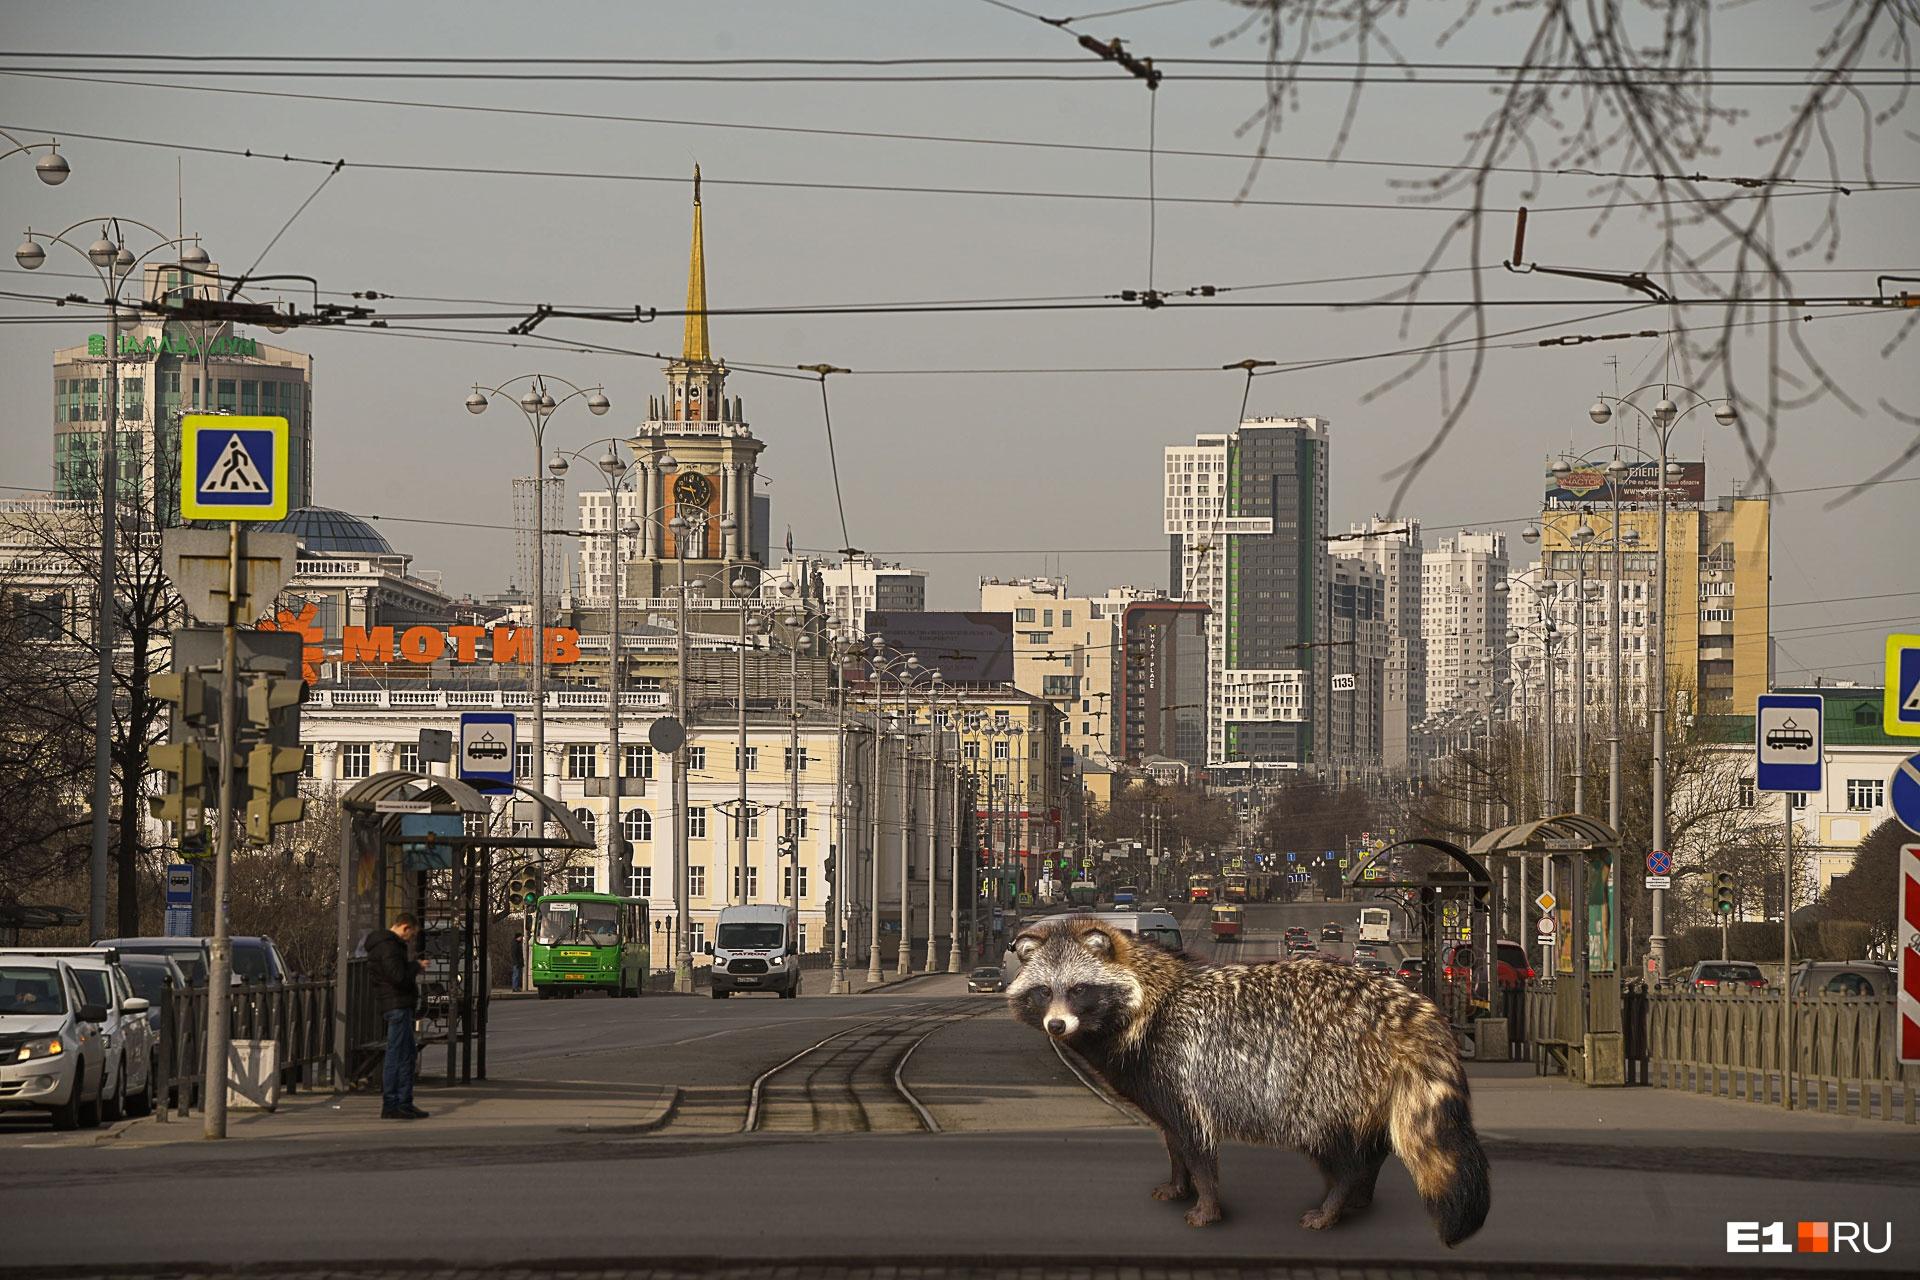 Енотовидная собака на проспекте Ленина